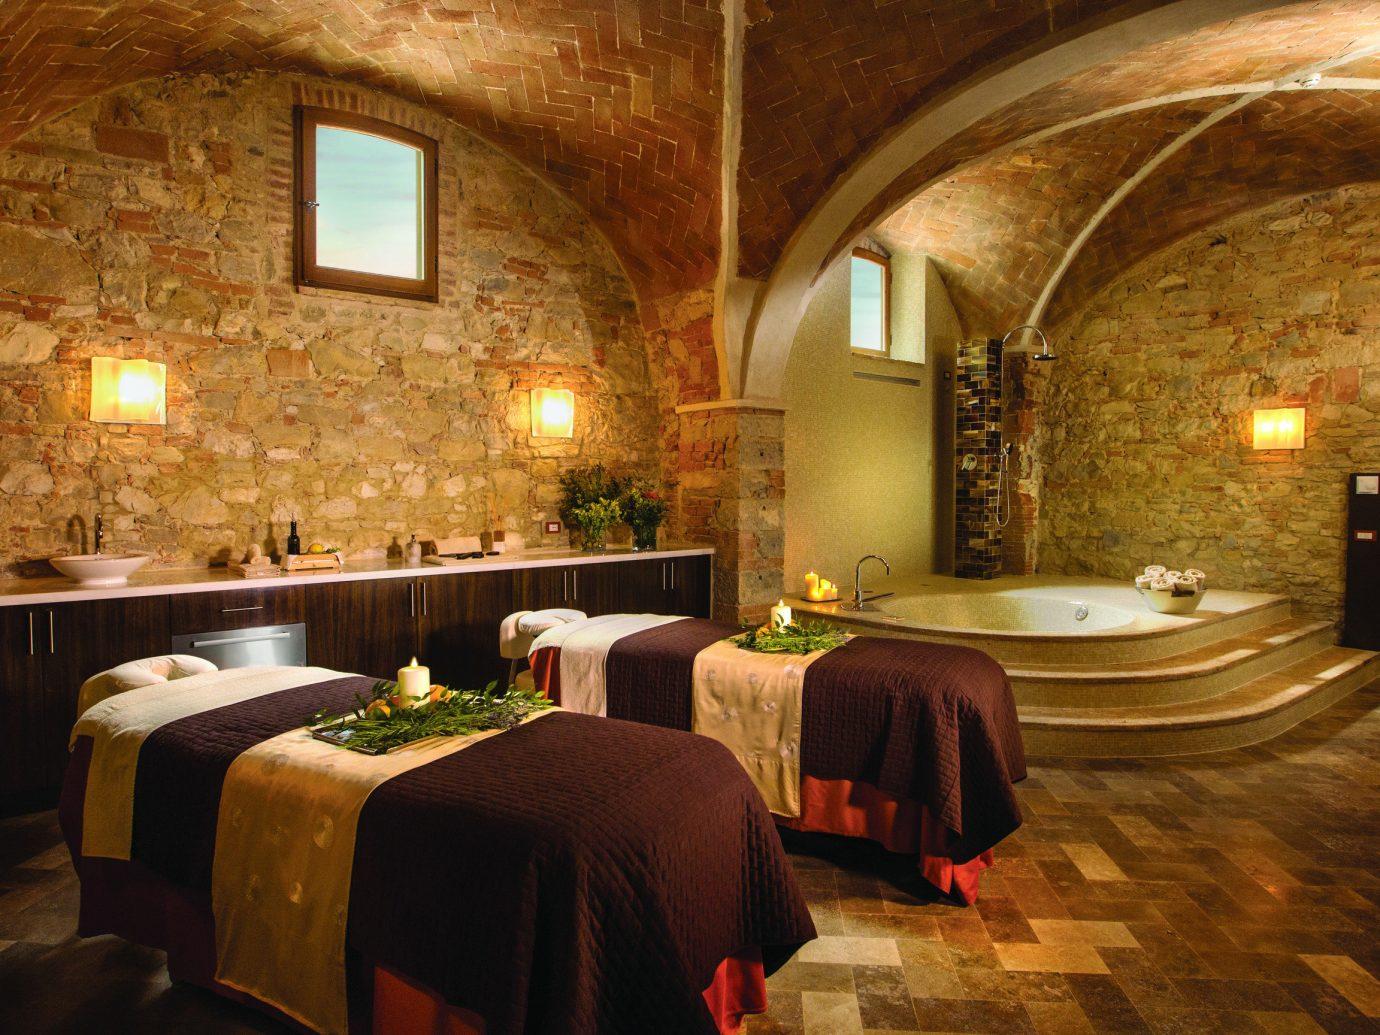 Health + Wellness Hotels Spa Retreats indoor floor property room estate interior design hacienda mansion Suite stone